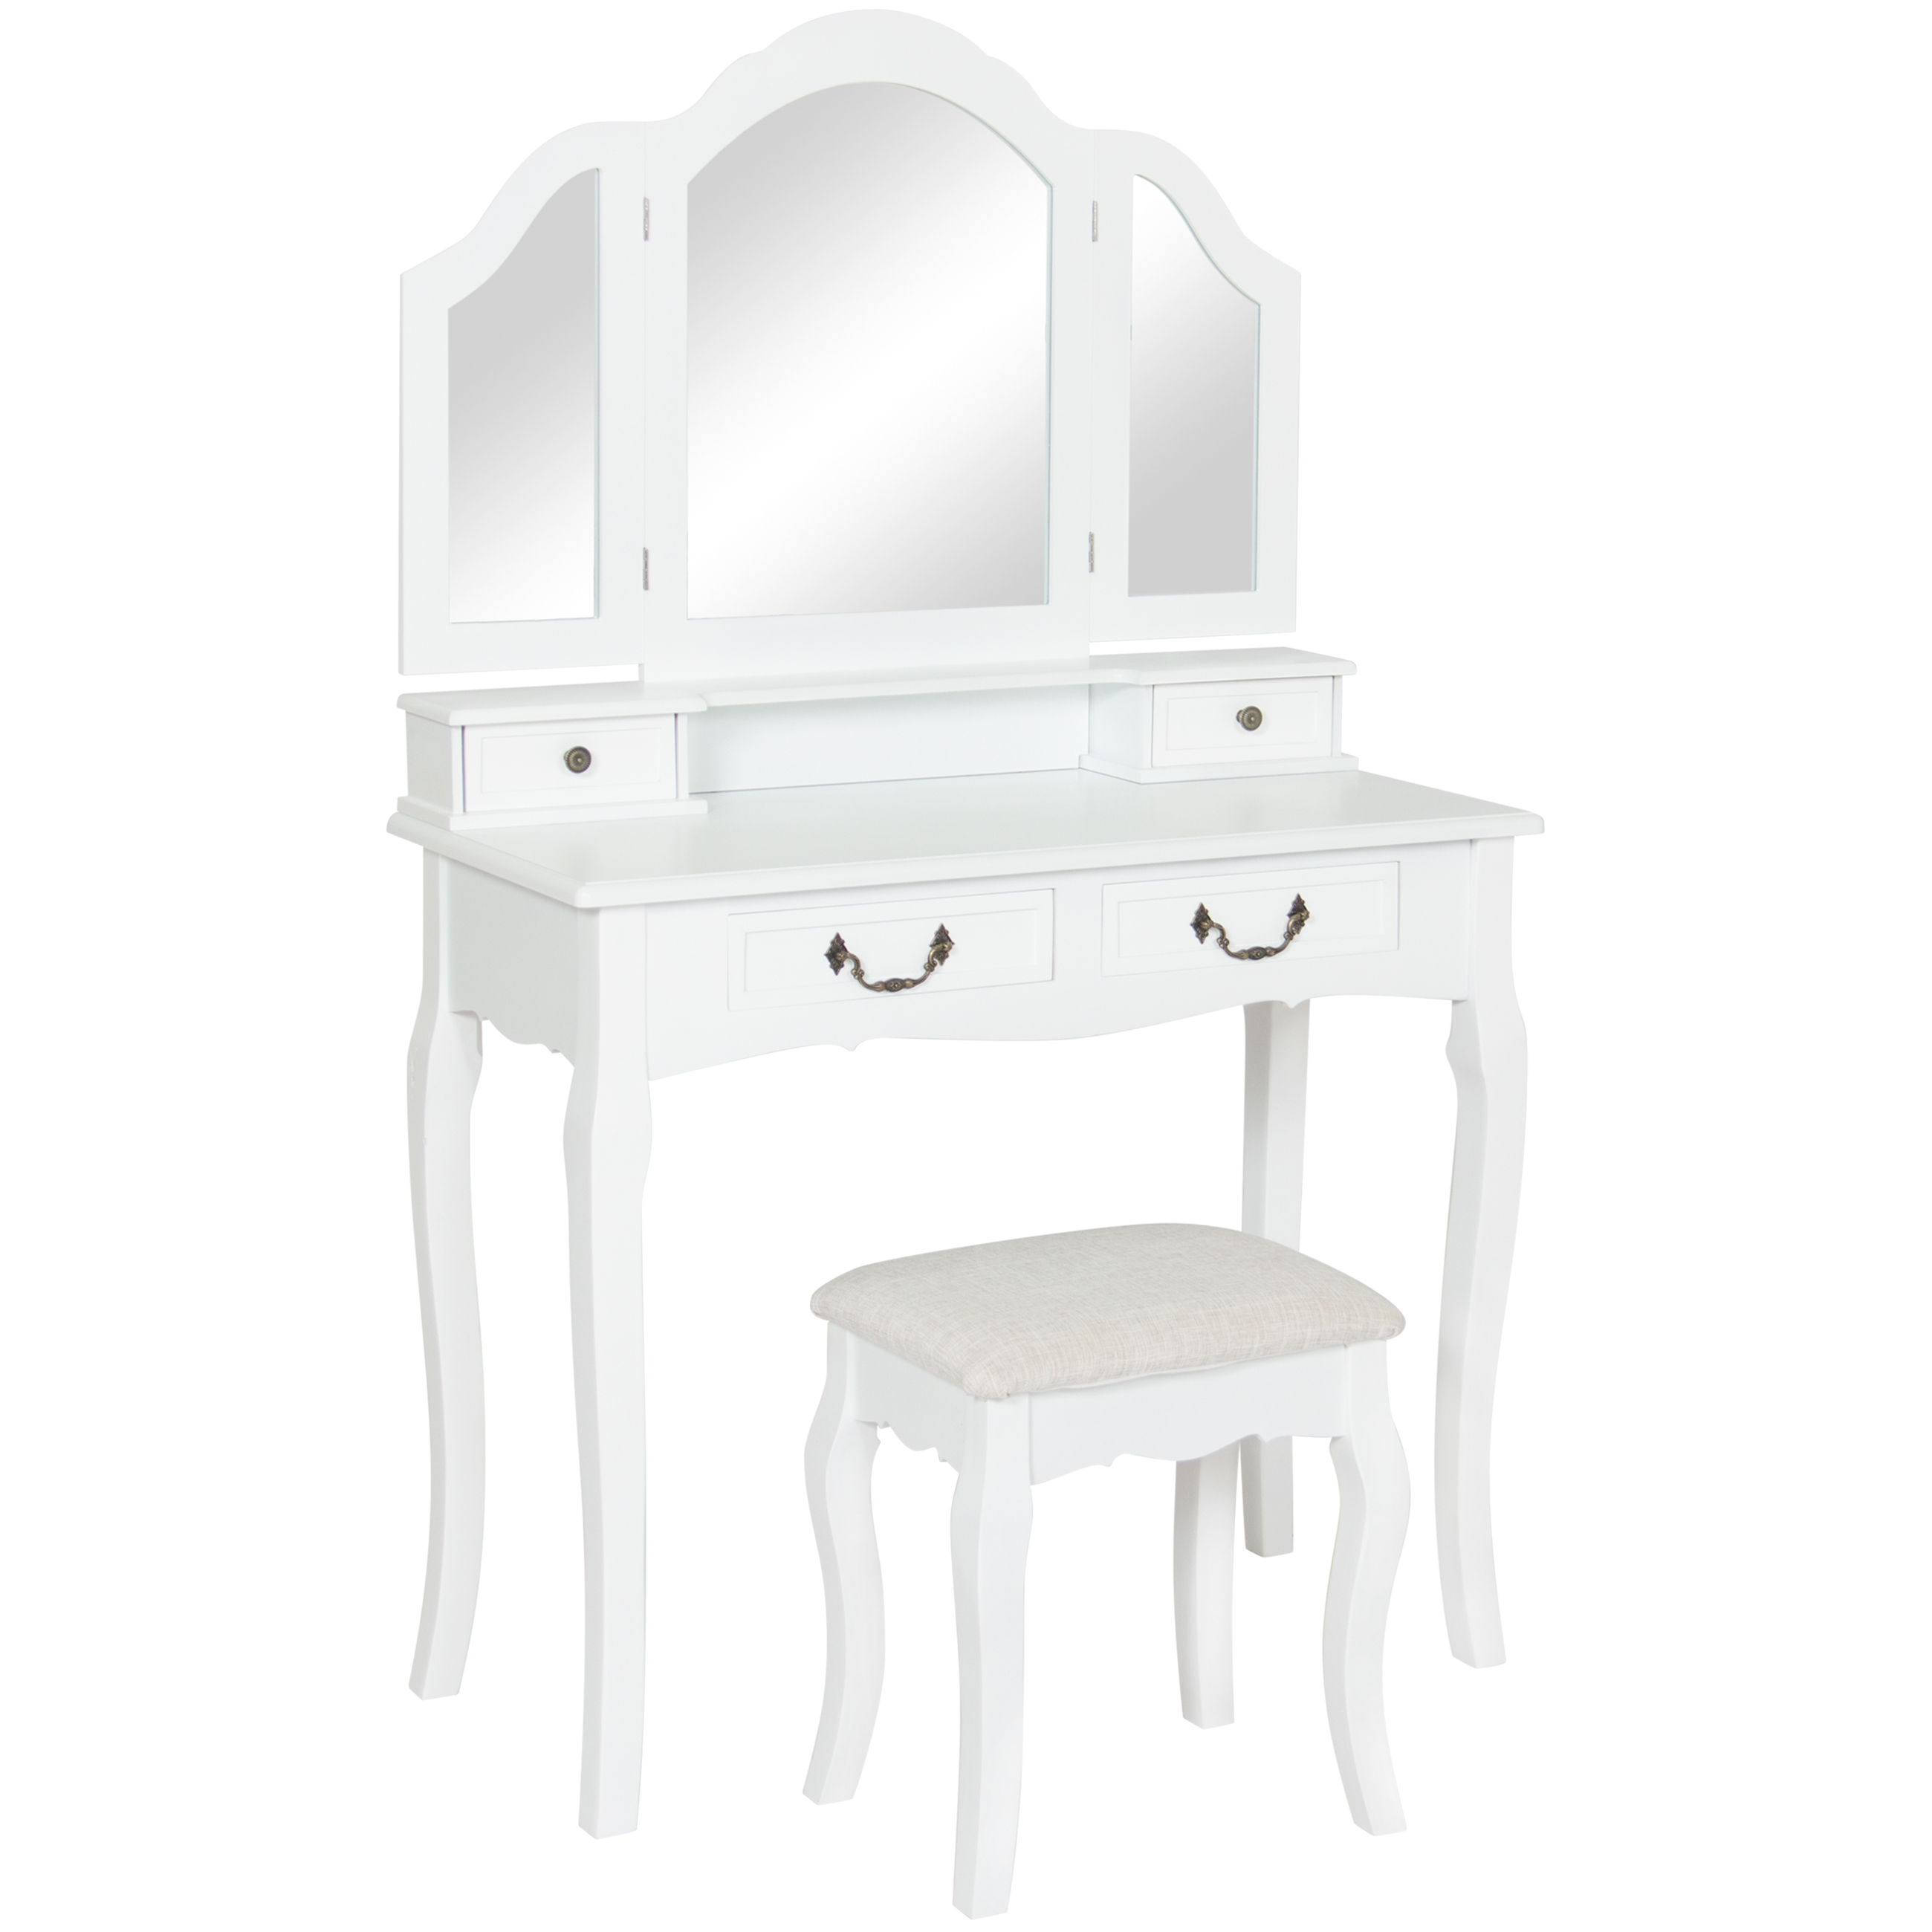 Best Choice Products Bathroom Tri-Mirror Vanity Table Set W  Stool Hair Dressing Organizer- White by